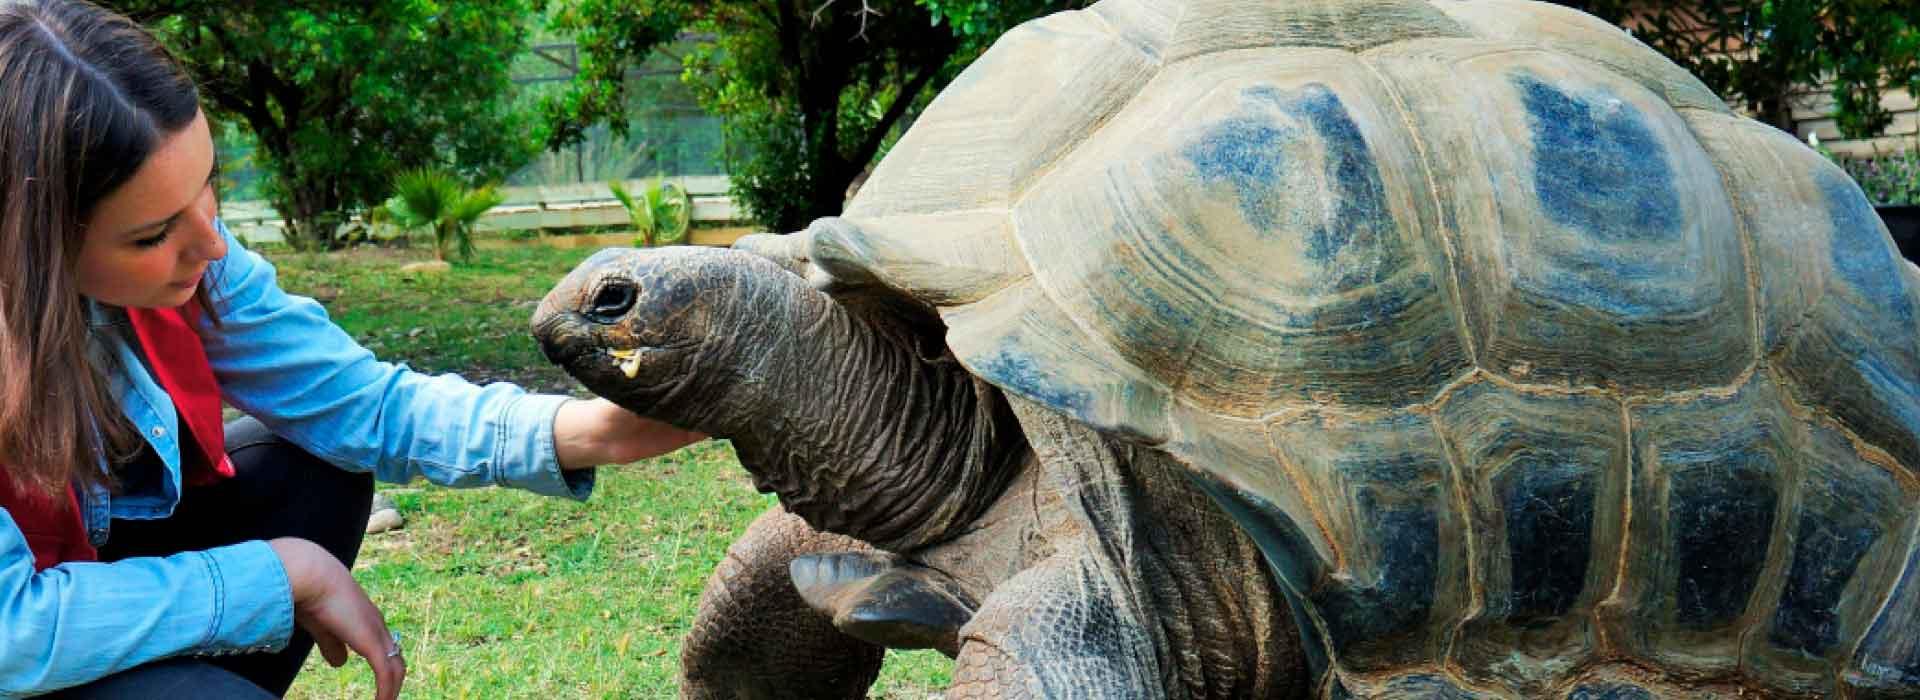 formation continue animalier en parc zoologique